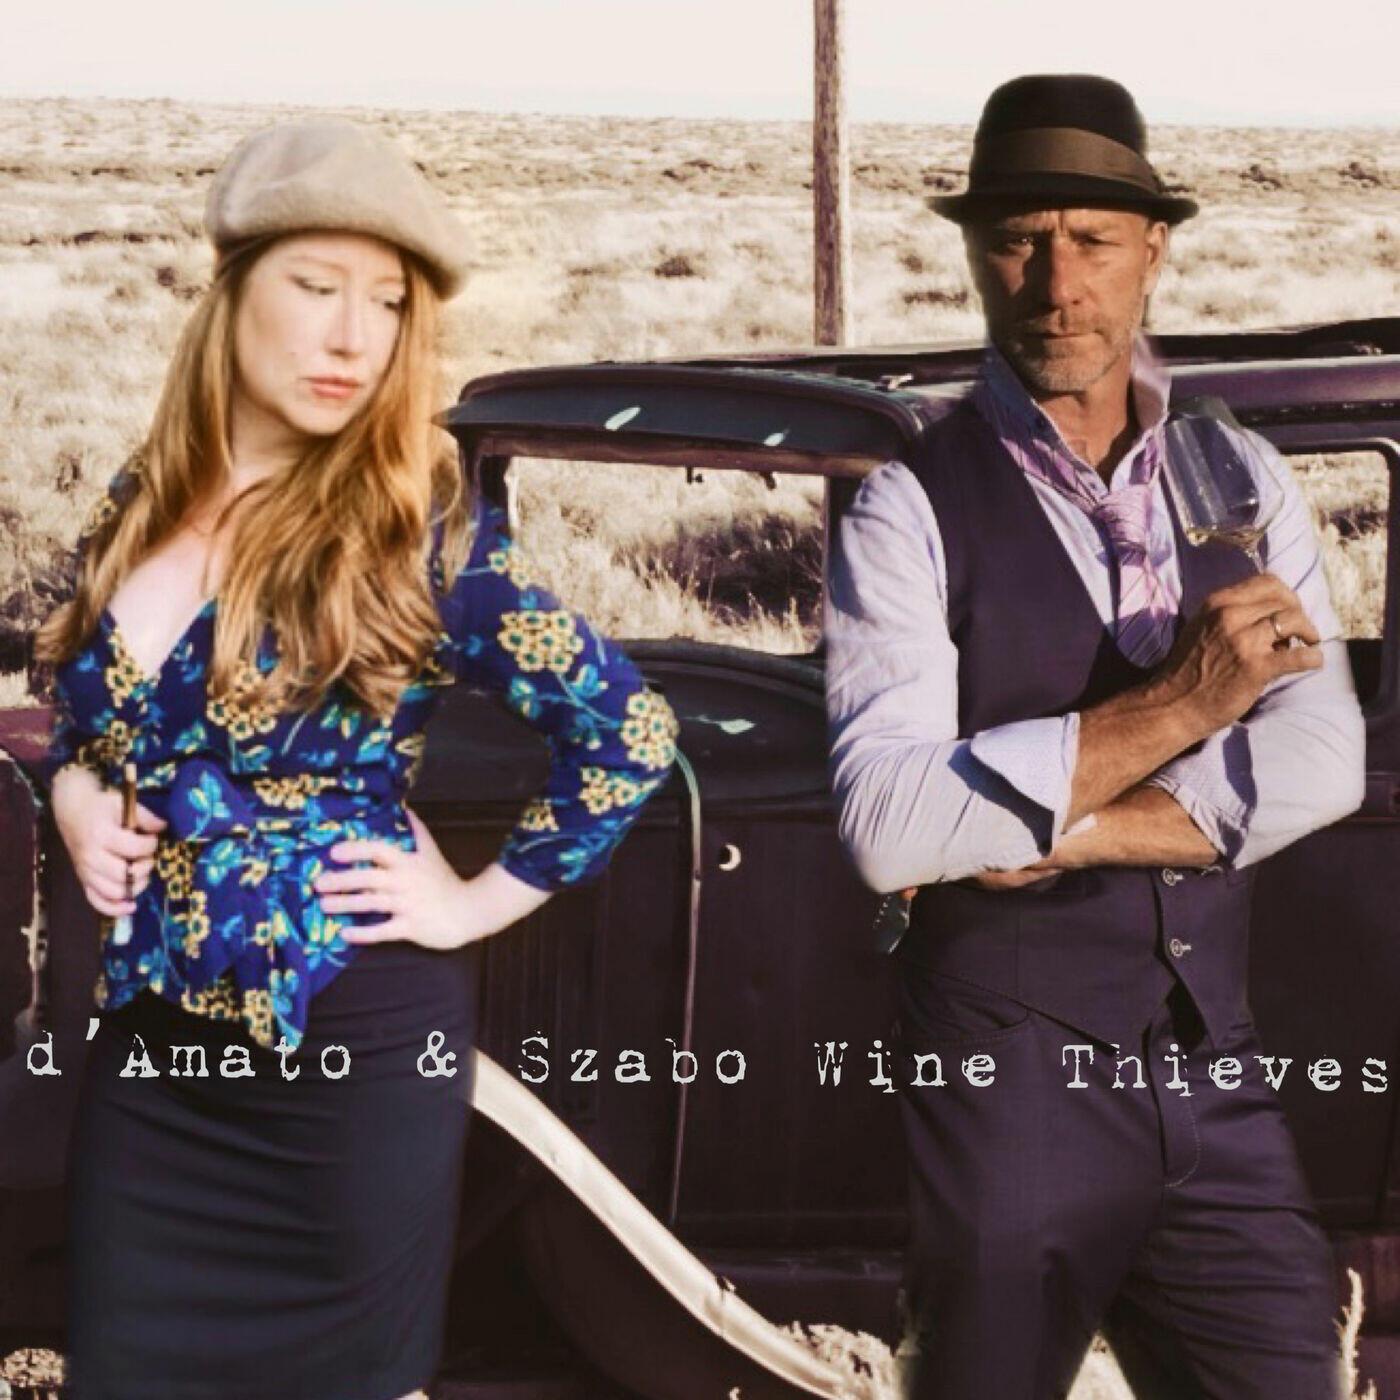 D'Amato & Szabo: Wine Thieves